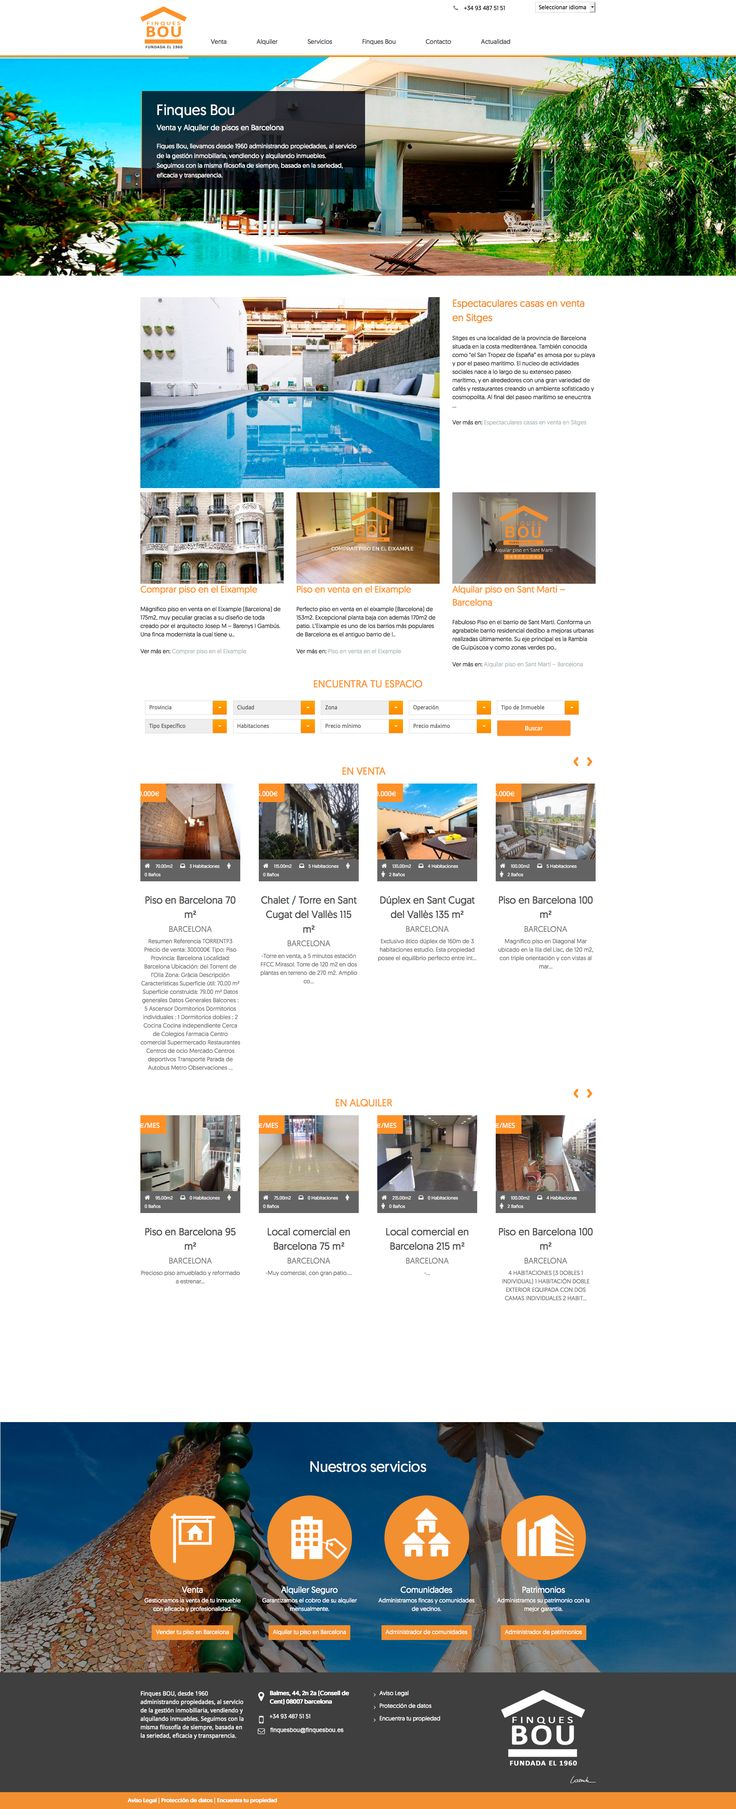 Nuevo diseño para la home de Finques Bou, inmobiliaria de Barcelona - #home #finquesbou #web #design #laende #barcelona